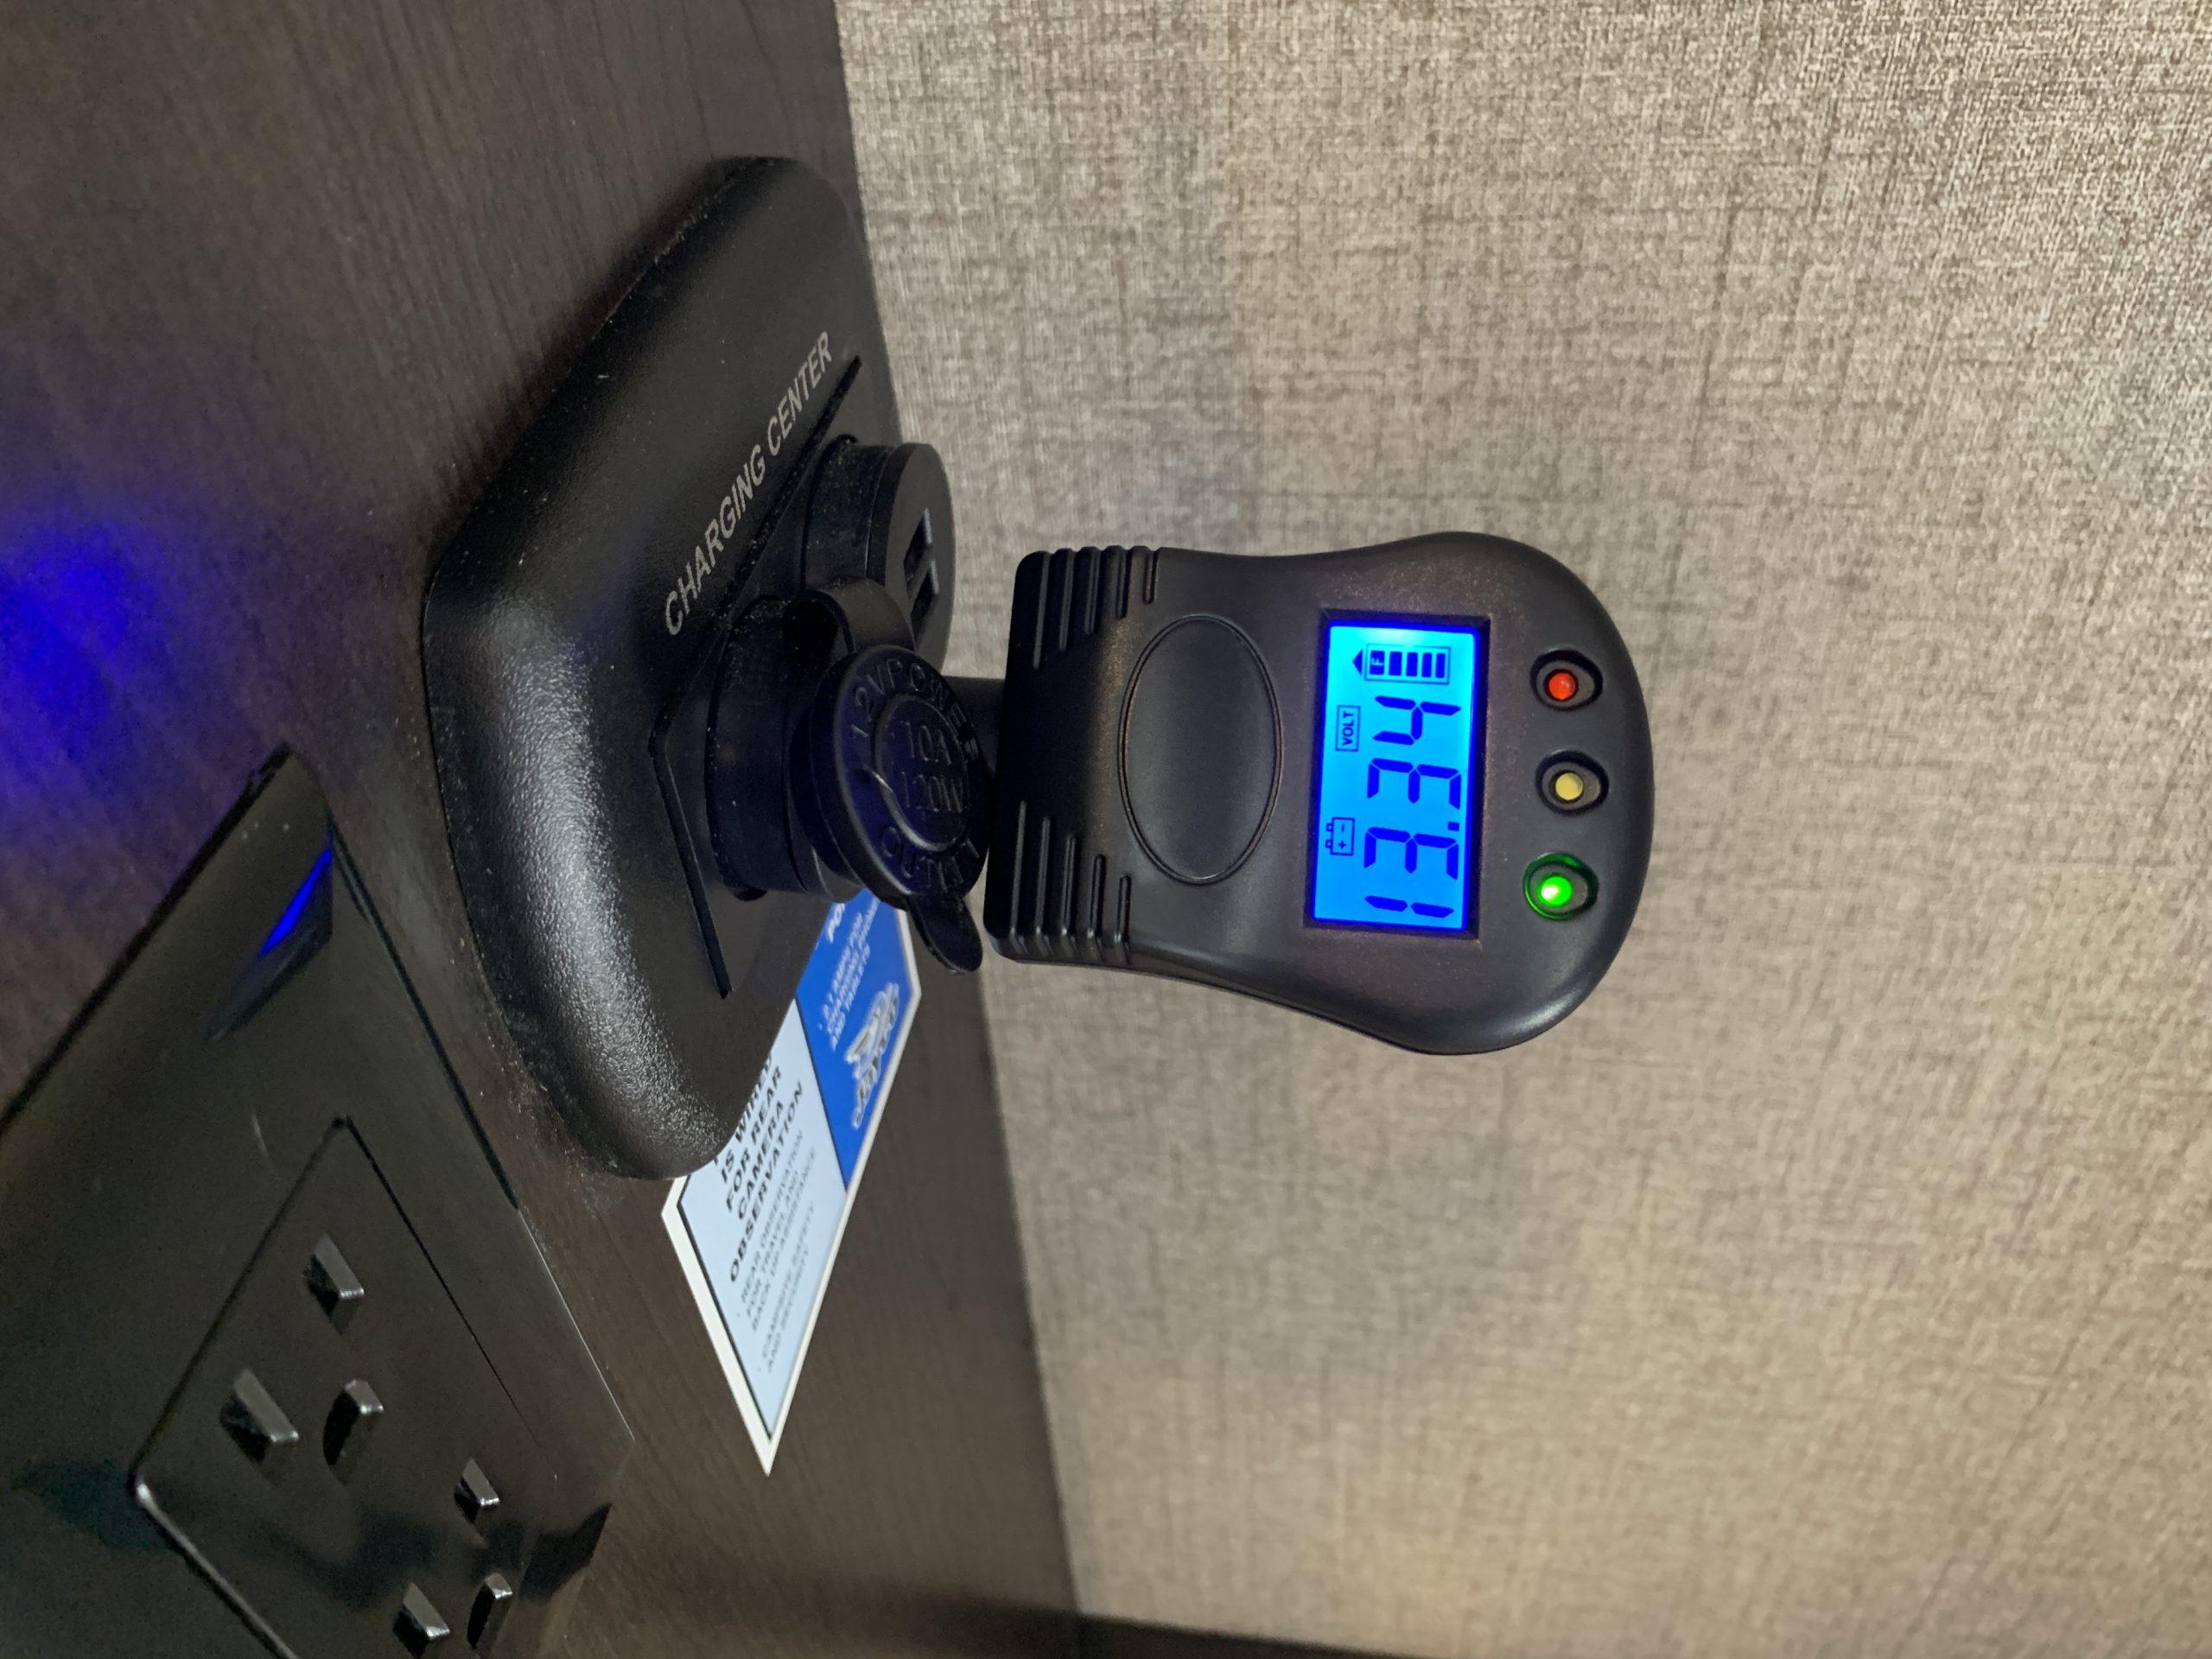 Plug-In Voltage Tester